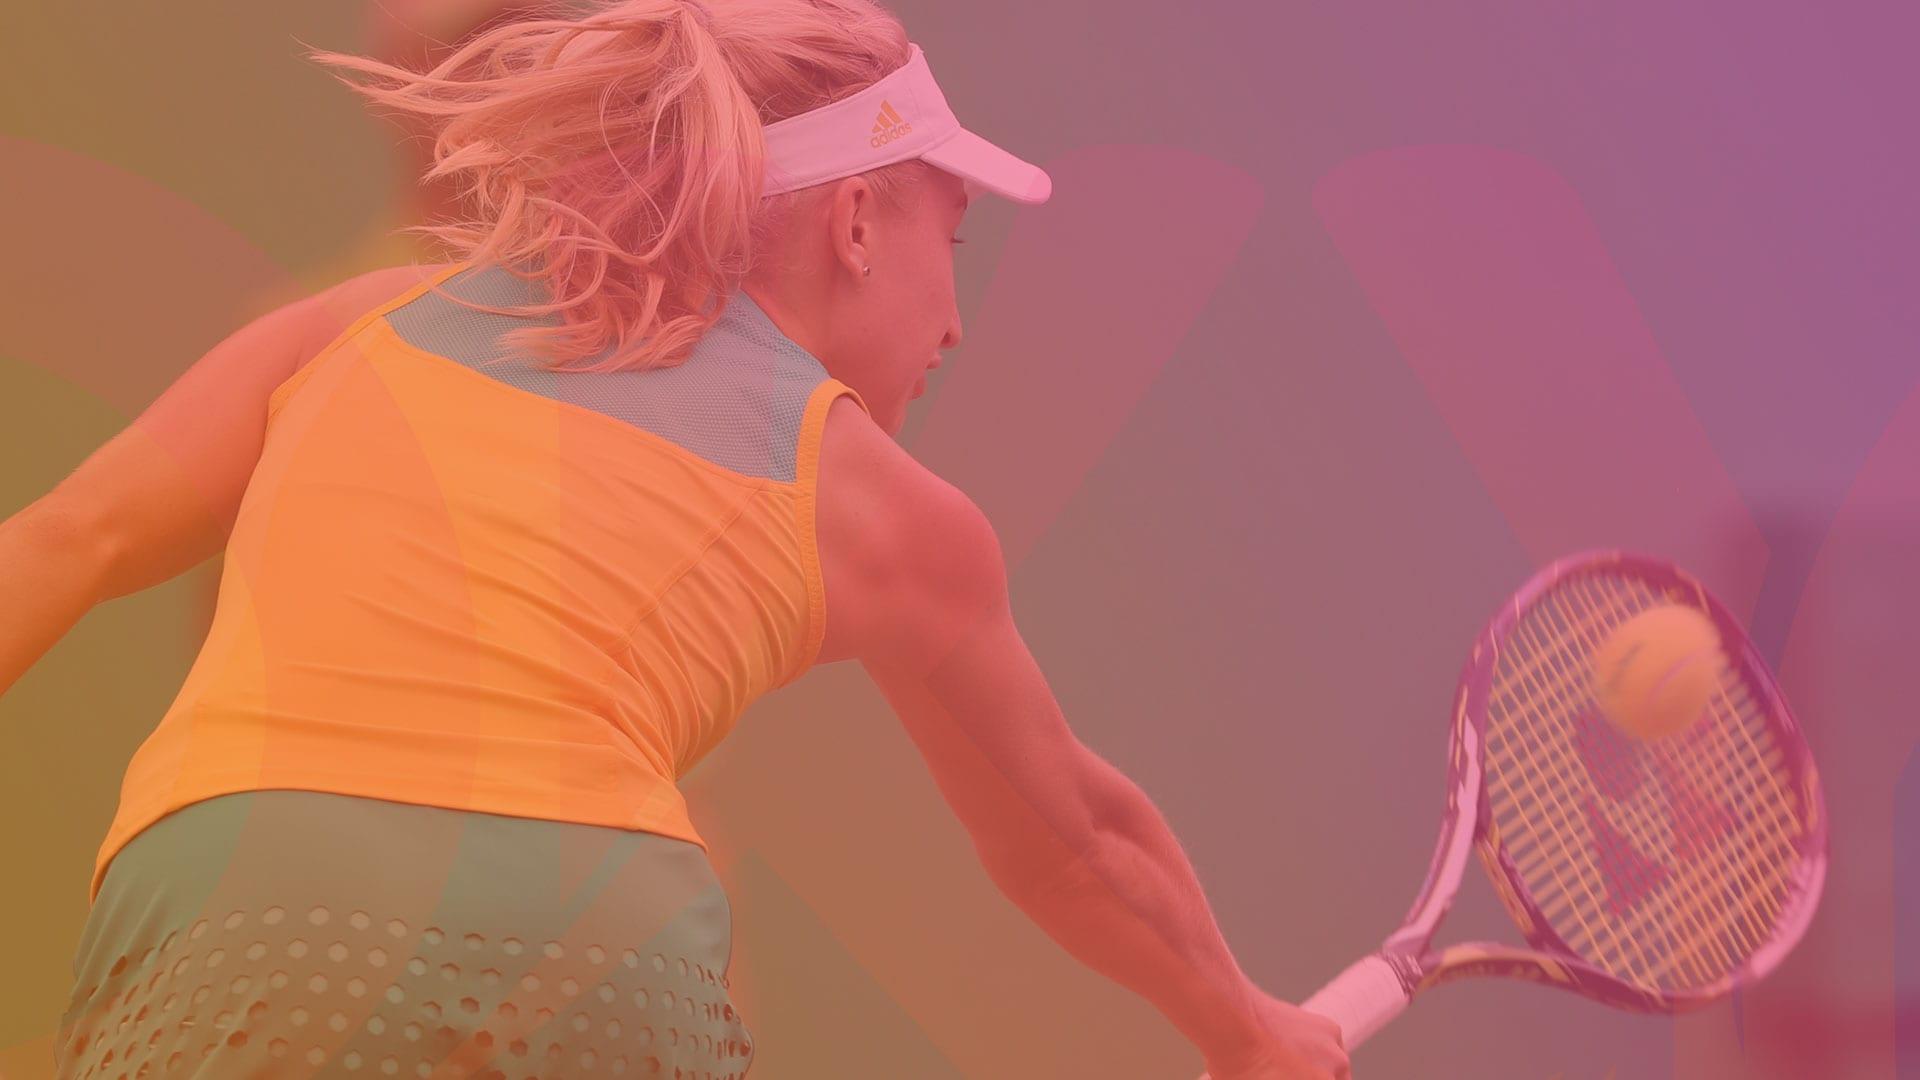 Women's Singles Round 1: Bencic (SUI) vs Pegula (USA)